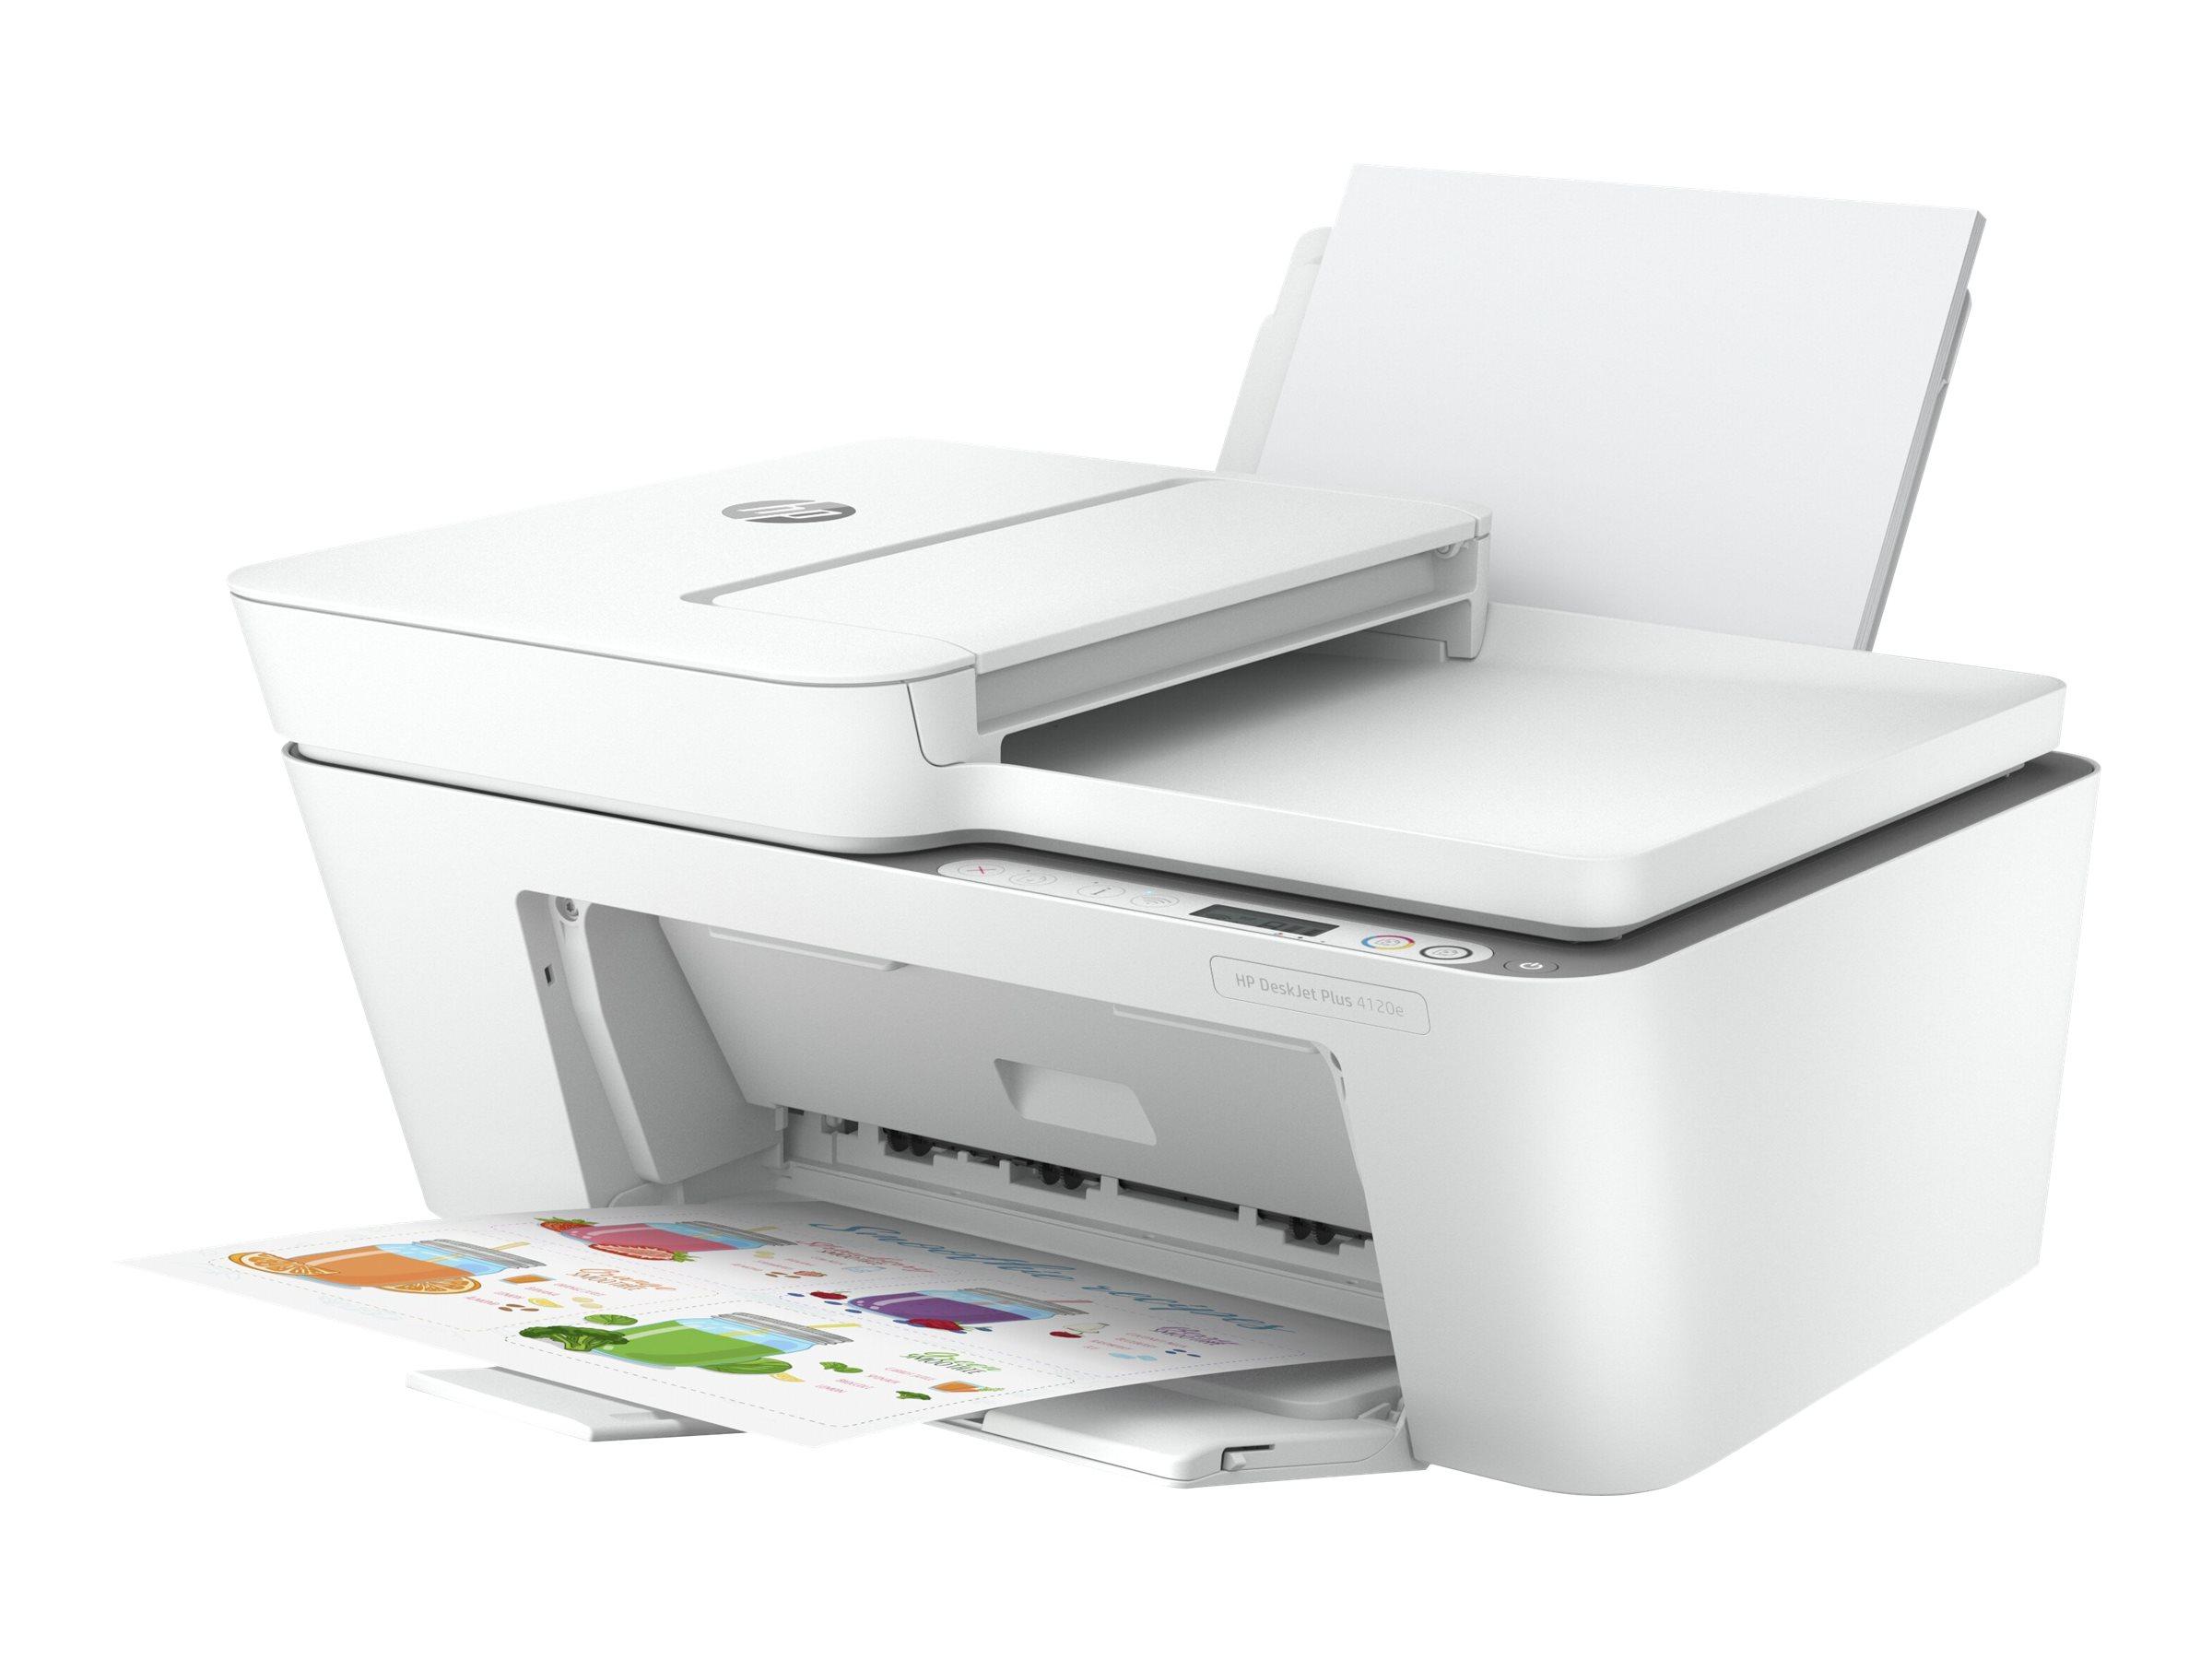 HP Deskjet 4120e All-in-One - Multifunktionsdrucker - Farbe - Tintenstrahl - A4 (210 x 297 mm) (Original) - A4/Legal (Medien)